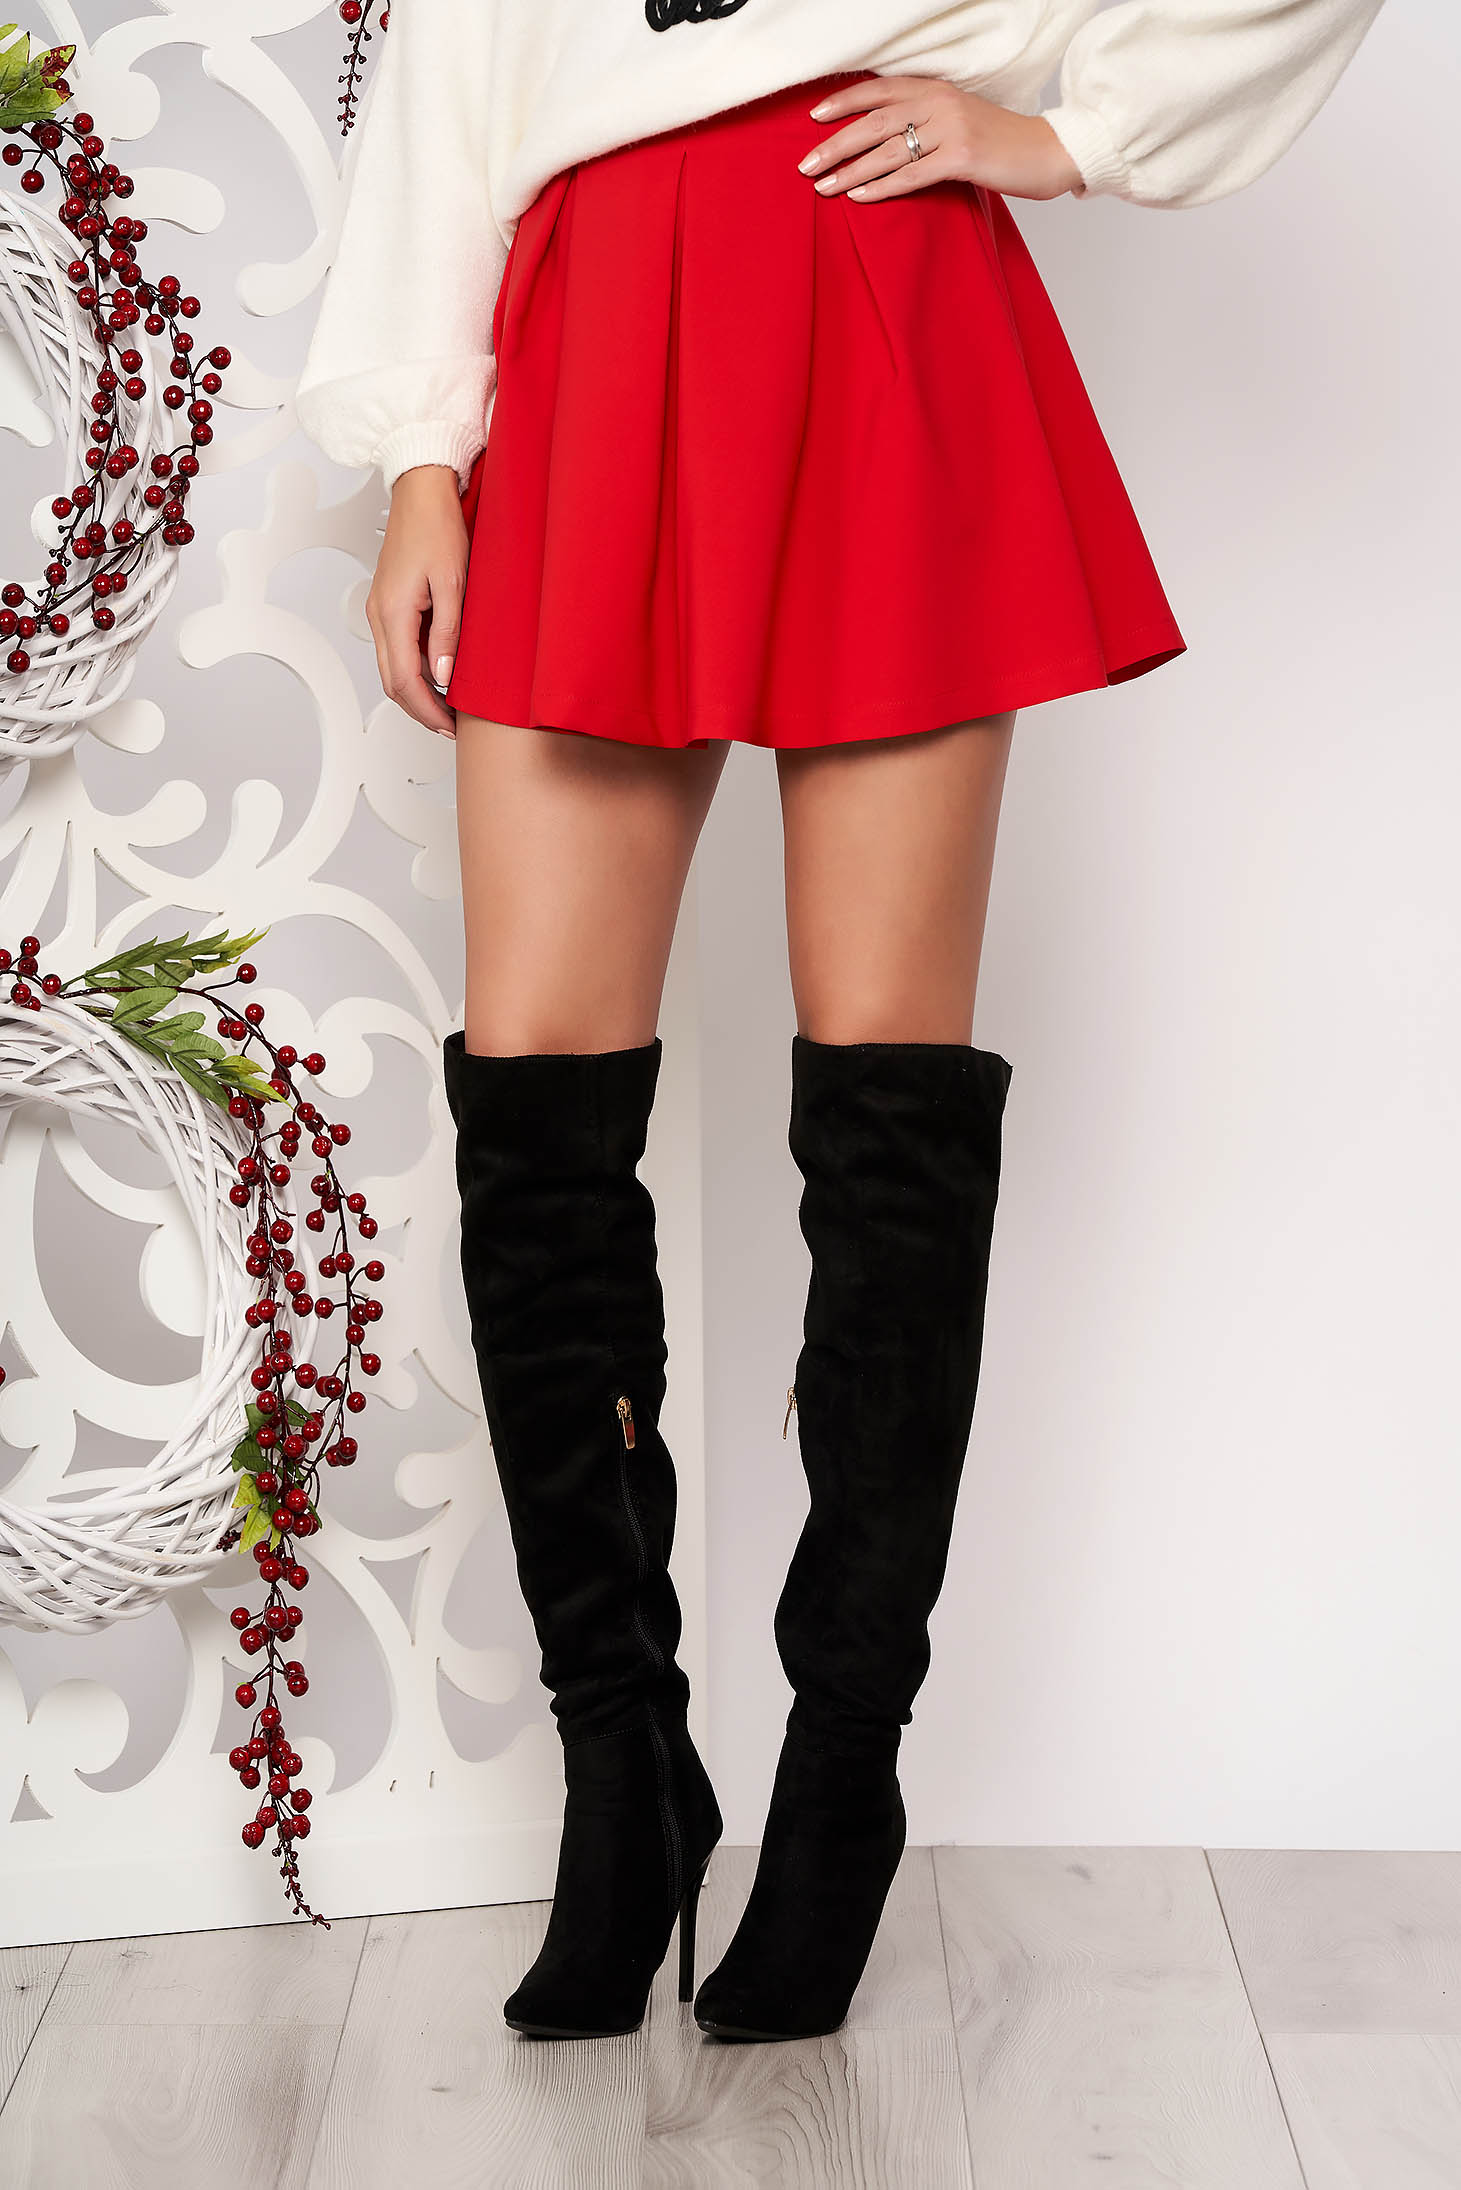 Artista red casual cloche skirt slightly elastic fabric with medium waist